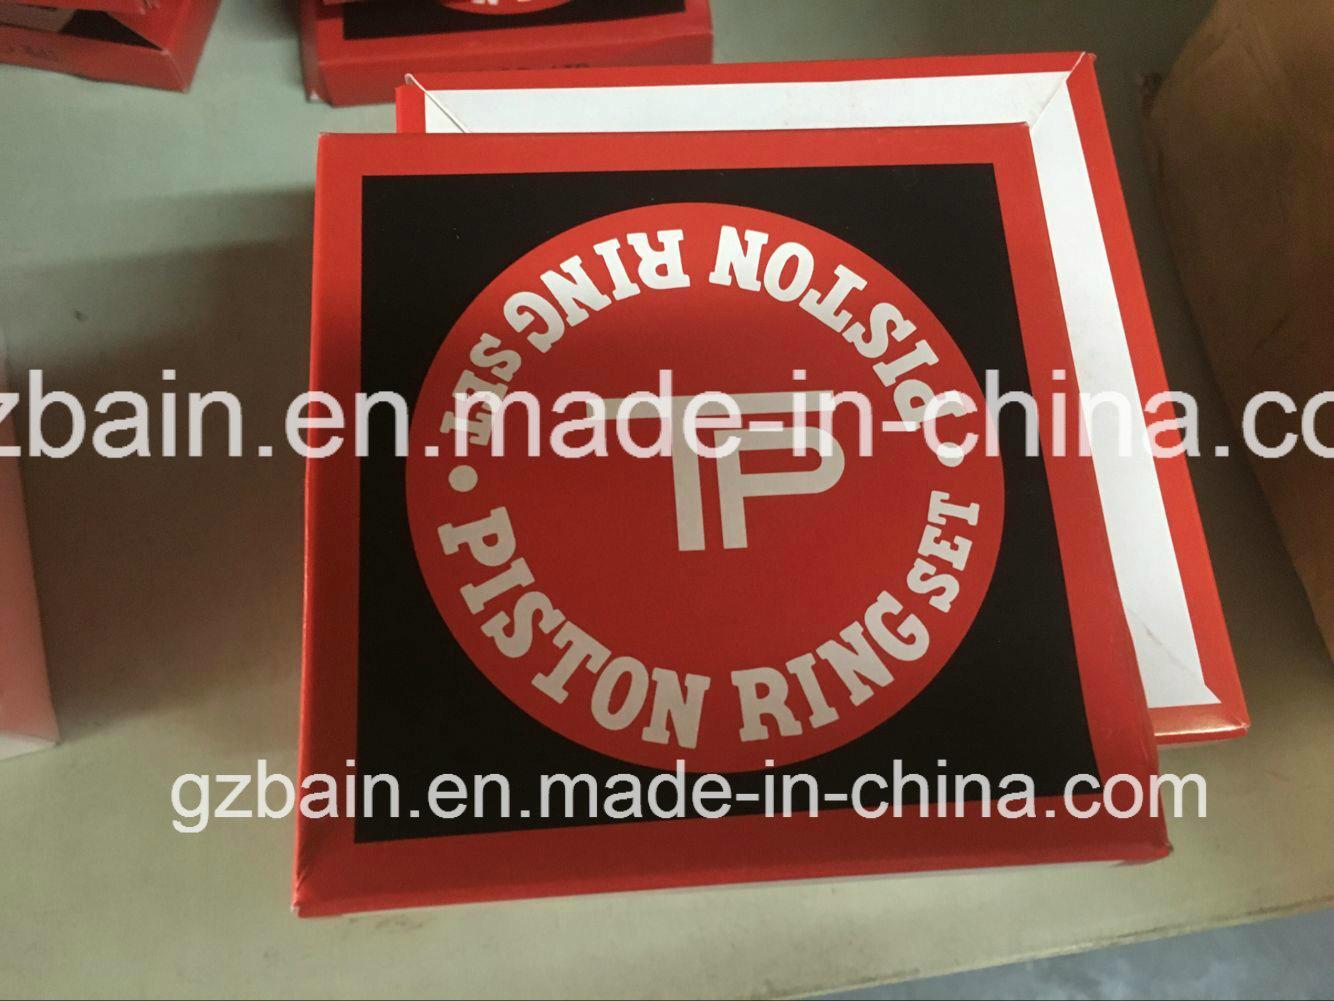 (4D95/4HK1 6D125 /4M40 J05E/J08E) Isuzu/Hino/Komatsu Original Genuine Npr/Tp/Rik Piston Ring